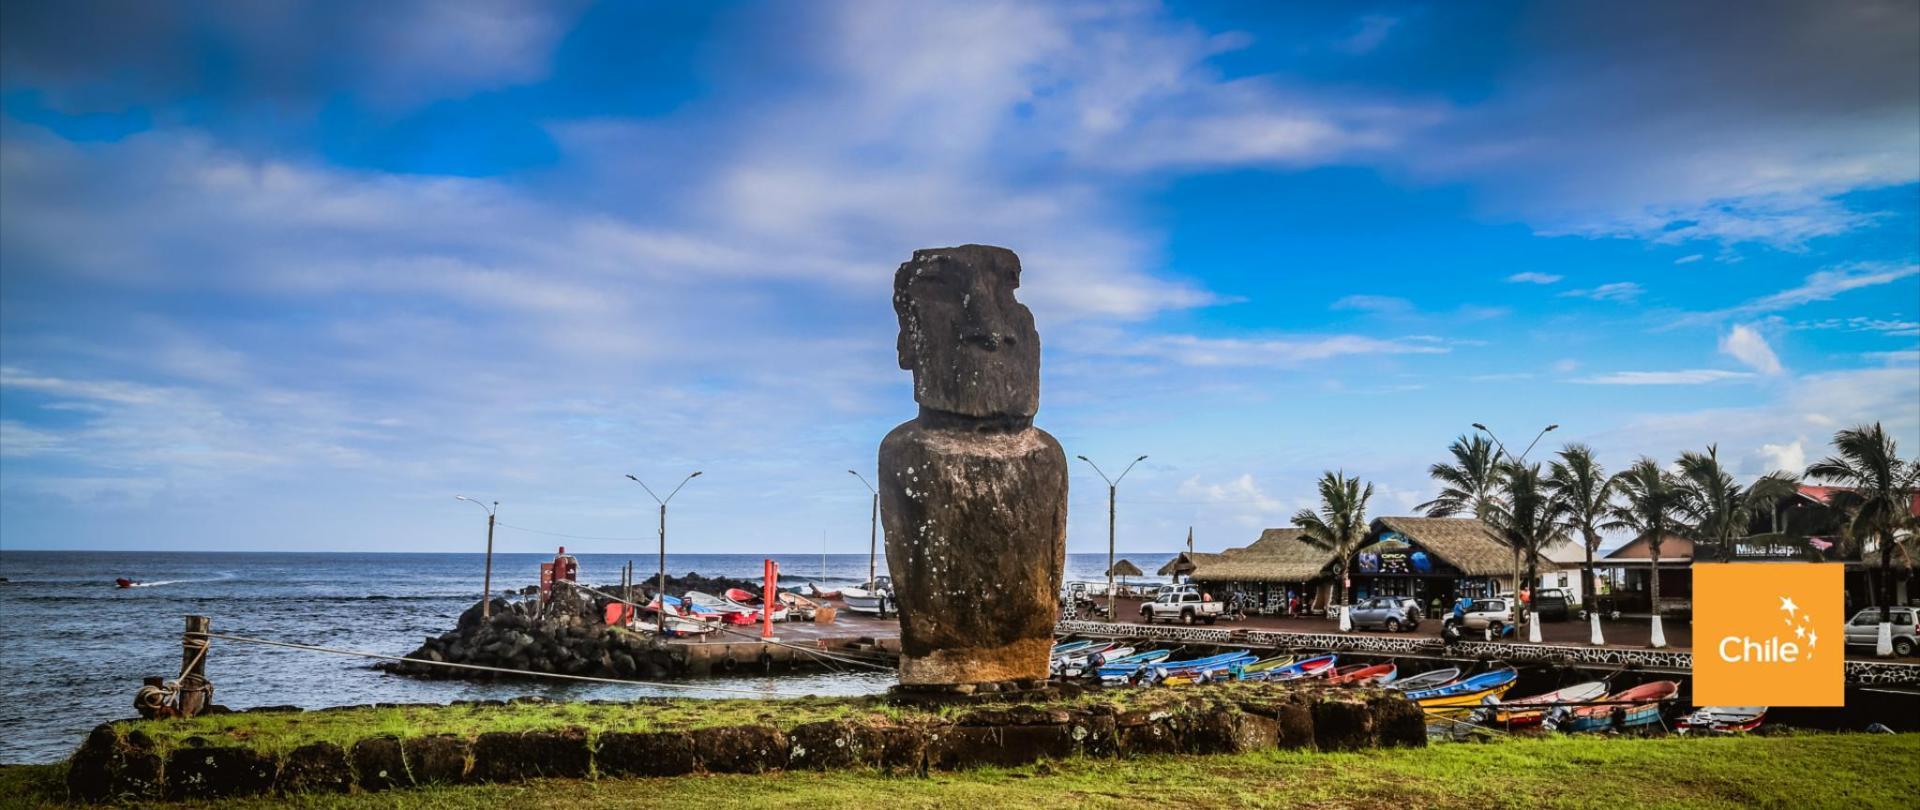 Hotel Rapa Nui.jpg